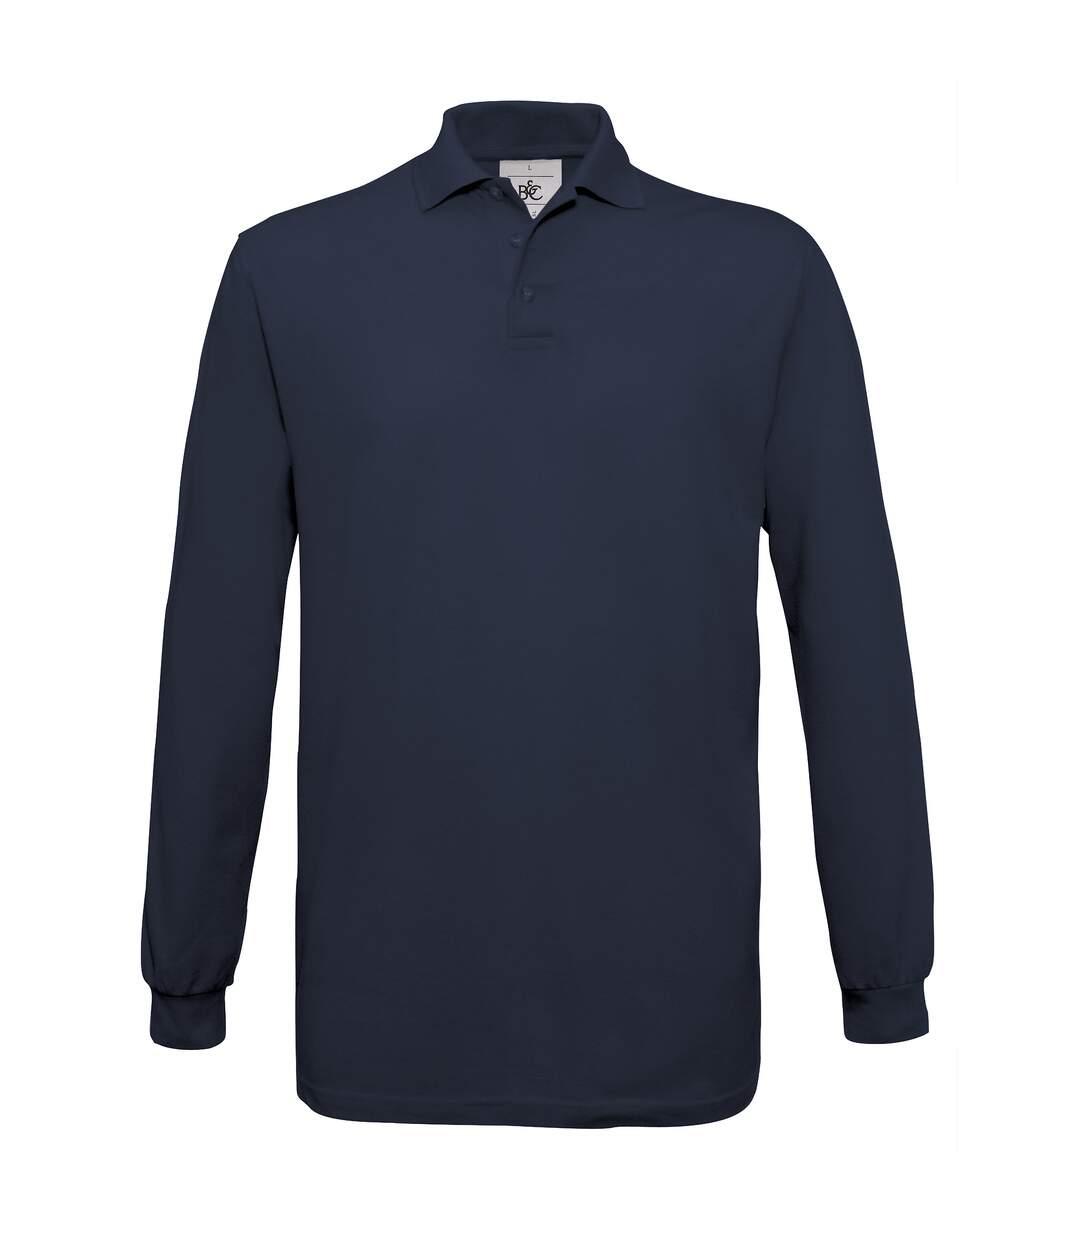 B&C Mens Safran Long Sleeve Cotton Polo Shirt (Red) - UTRW3005